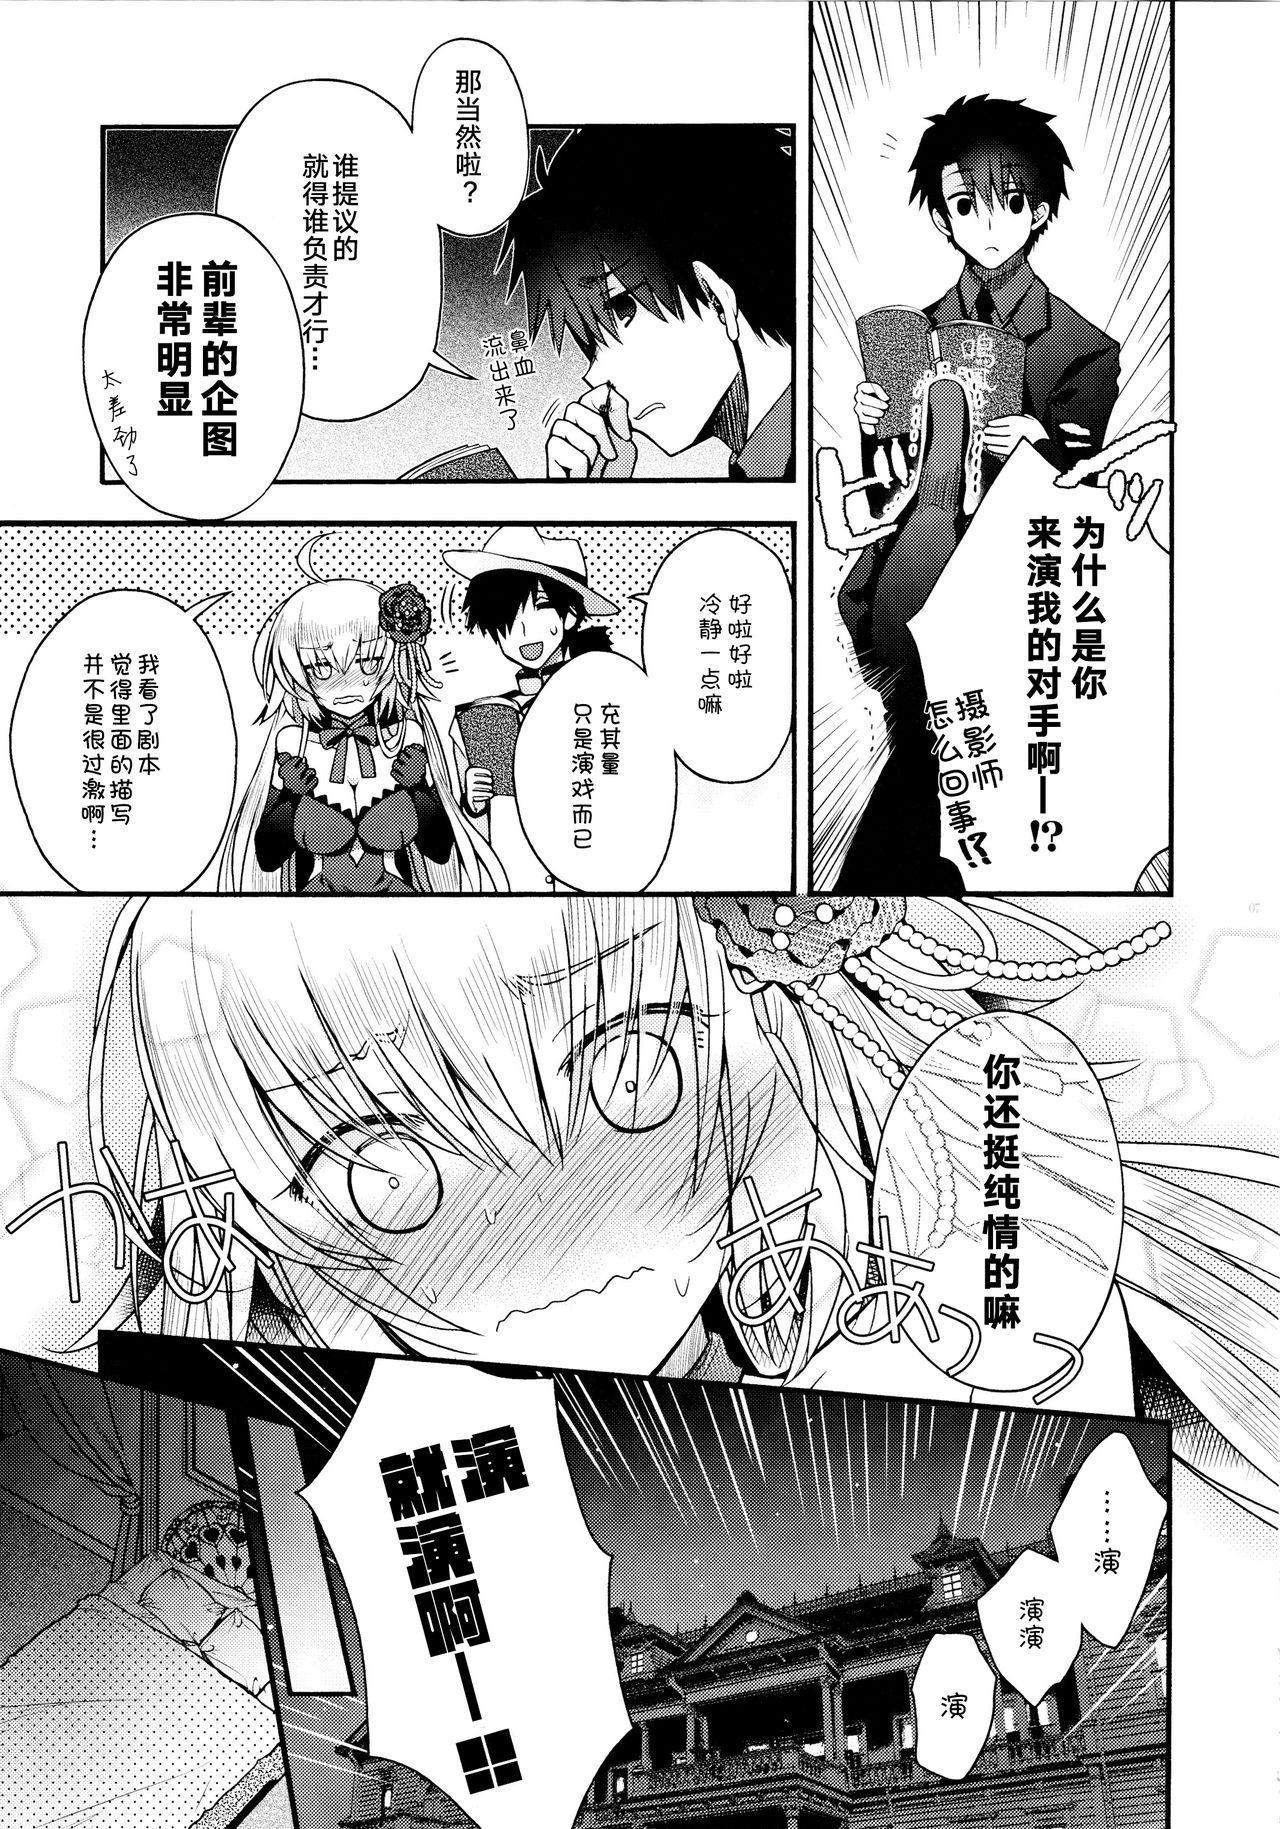 Utahime Eris to Seifu Koukan no Himitsu no Kankei 5